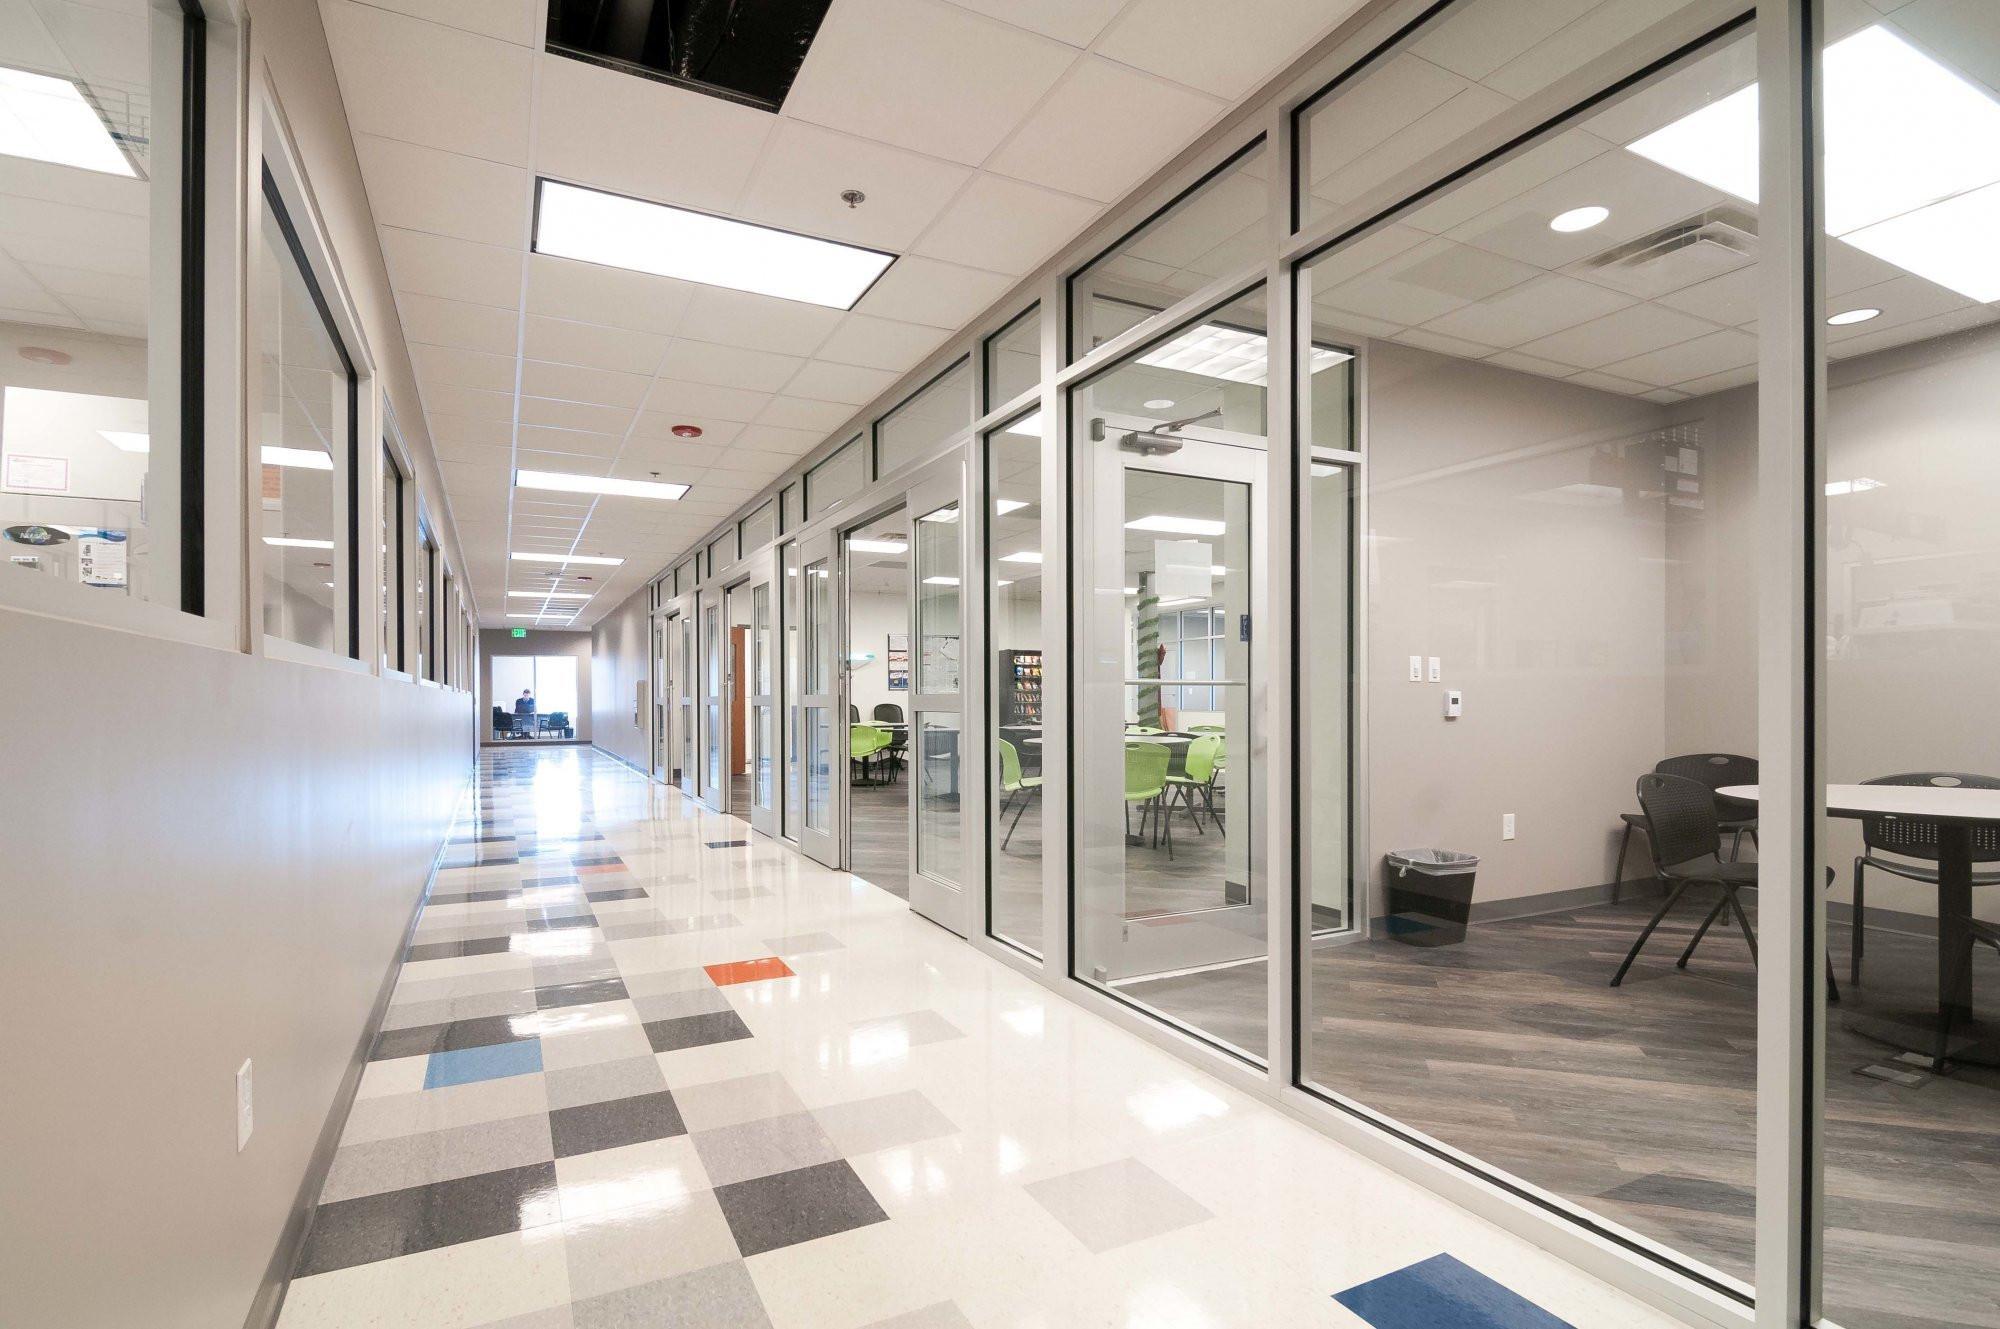 eurofins-office-laboratory-facility-hallway